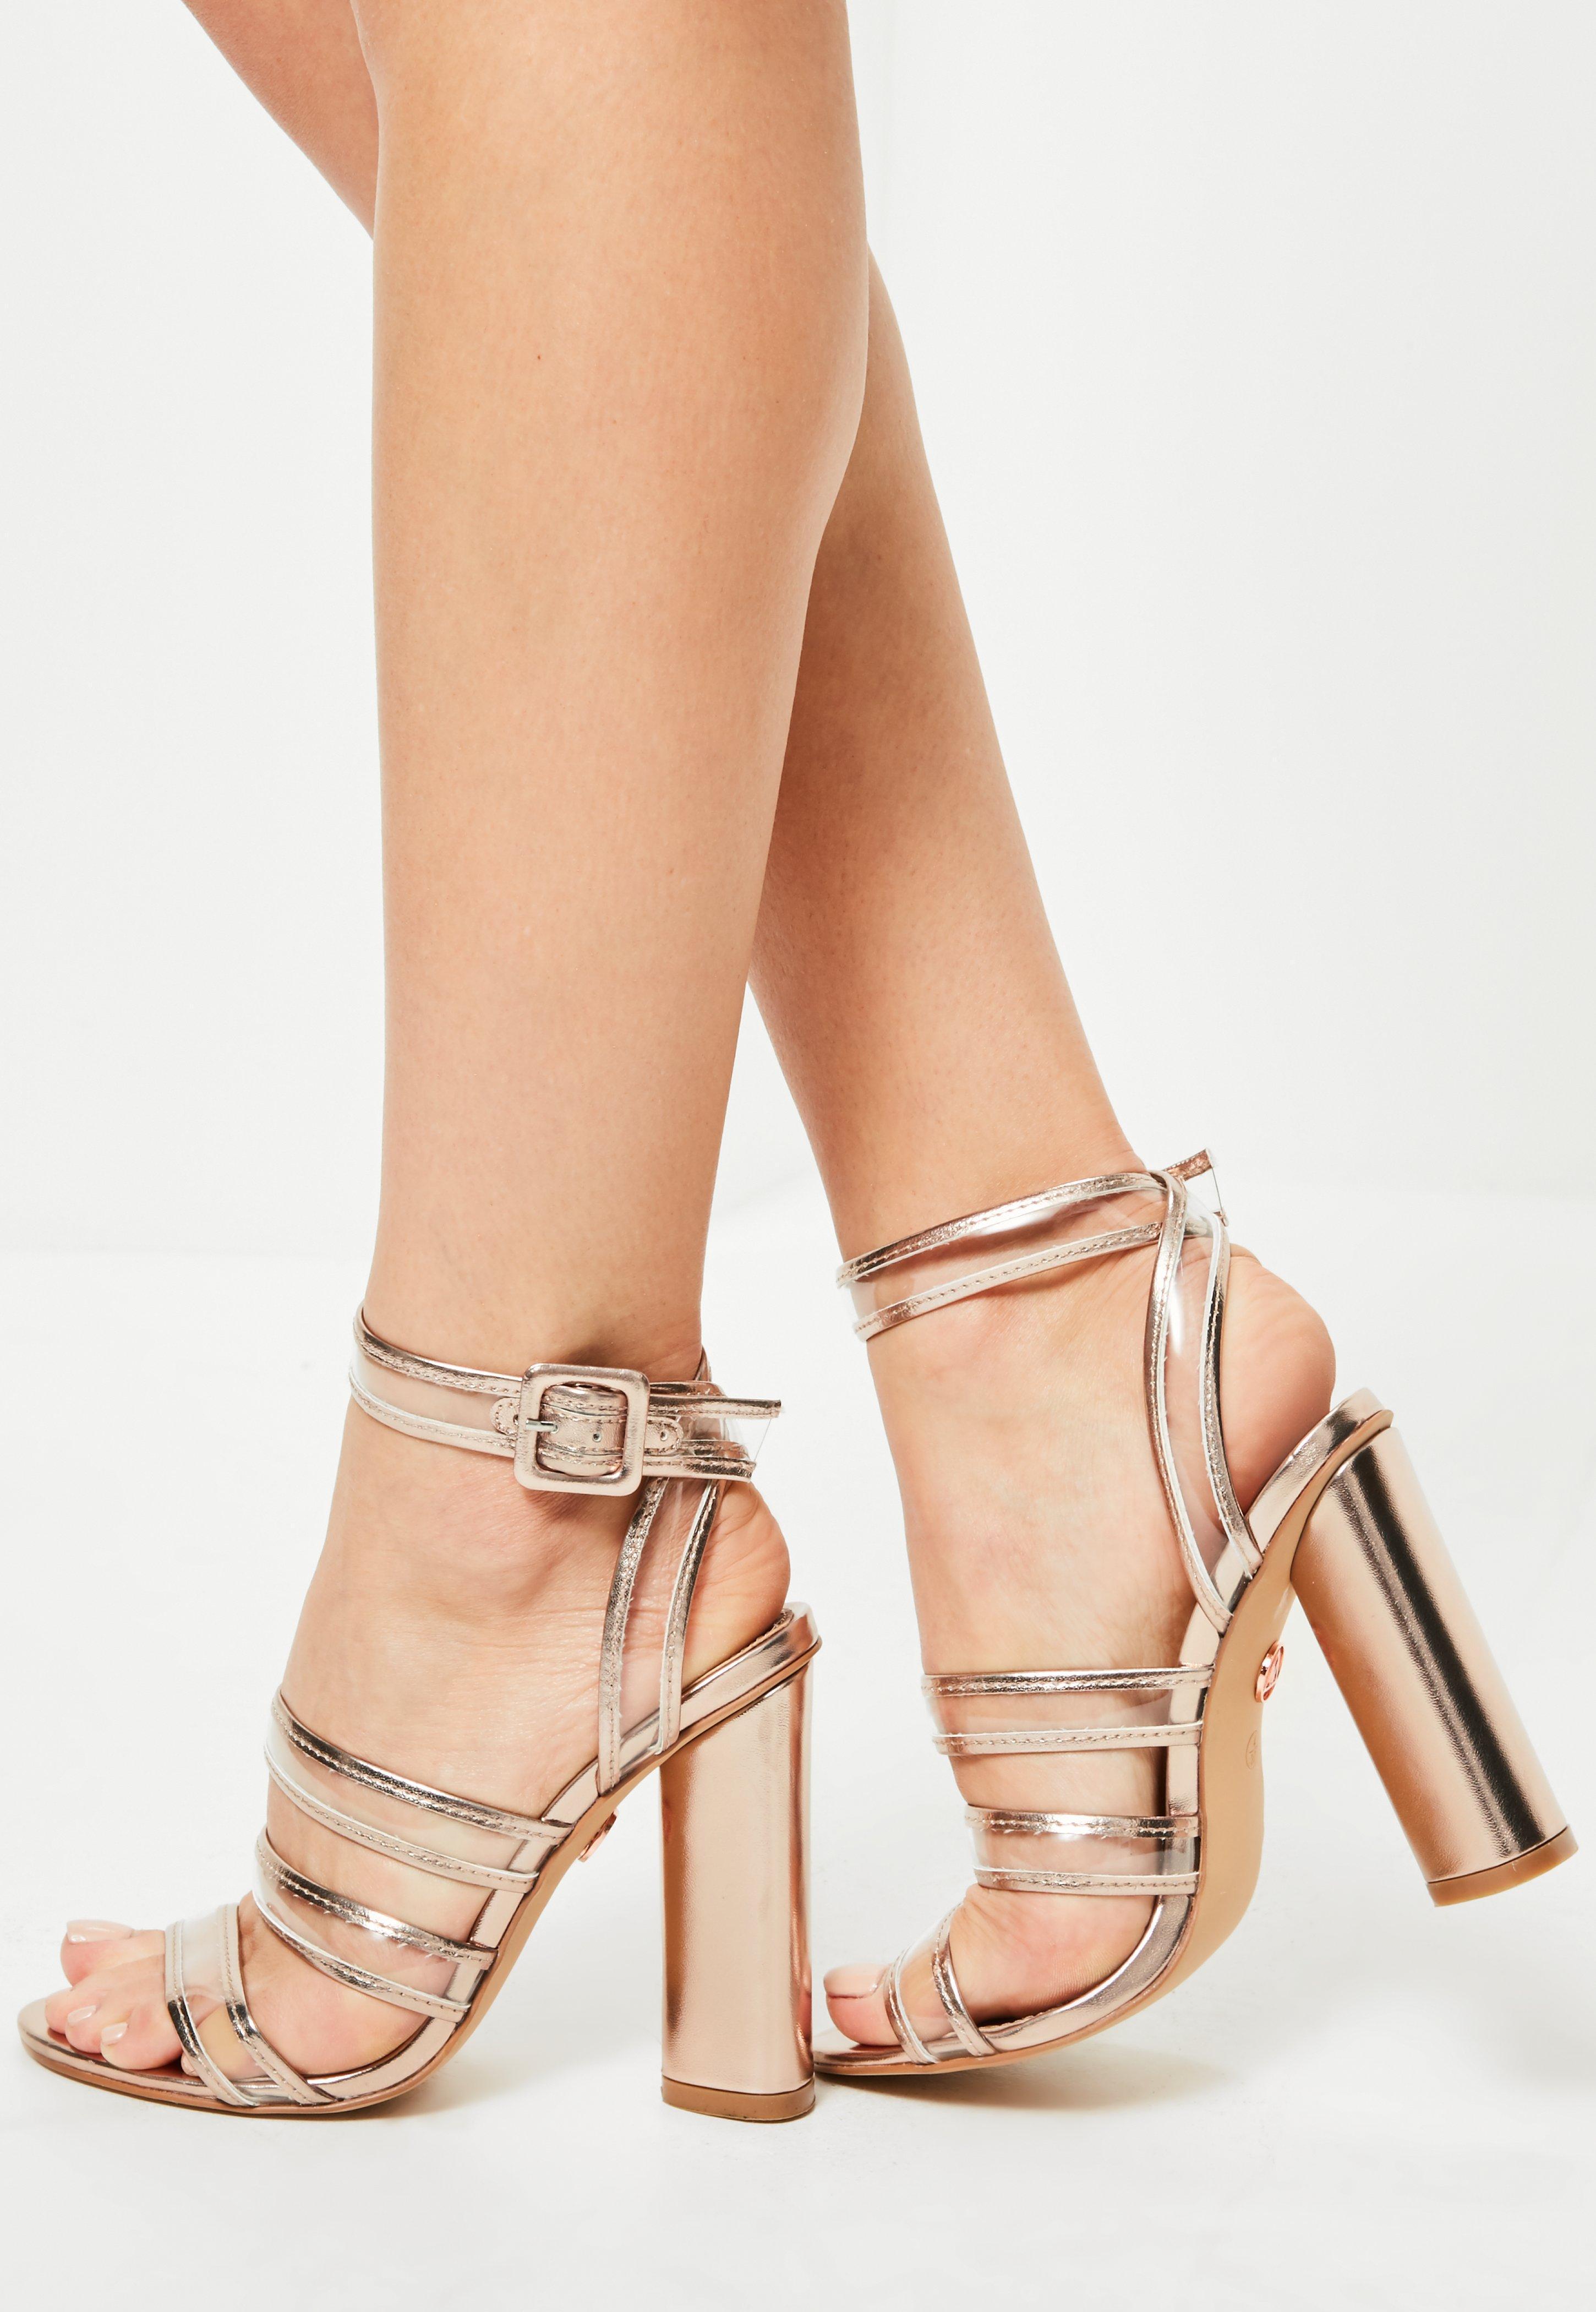 ce4c5403c1e8e Lyst - Missguided Rose Gold Clear Multi Strap Block Heeled Sandals ...